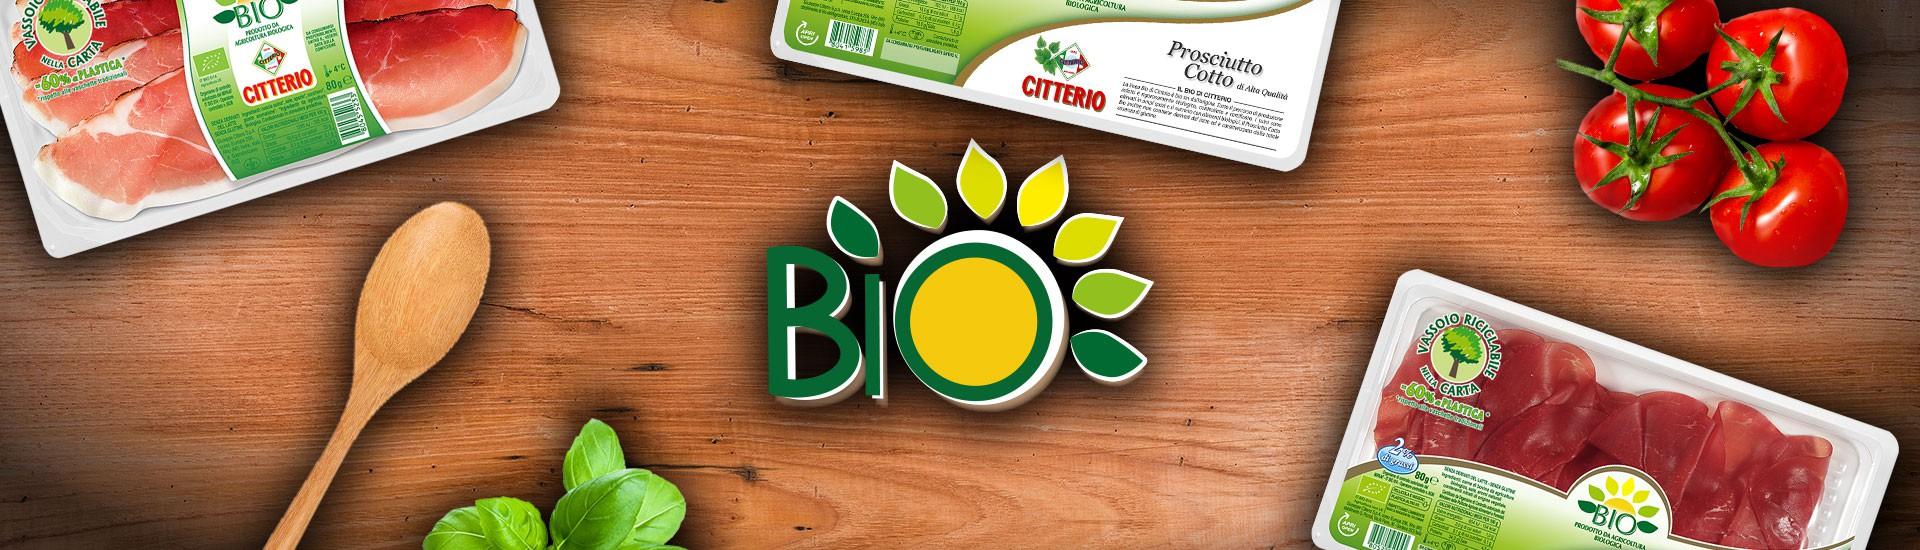 Organic cold cuts